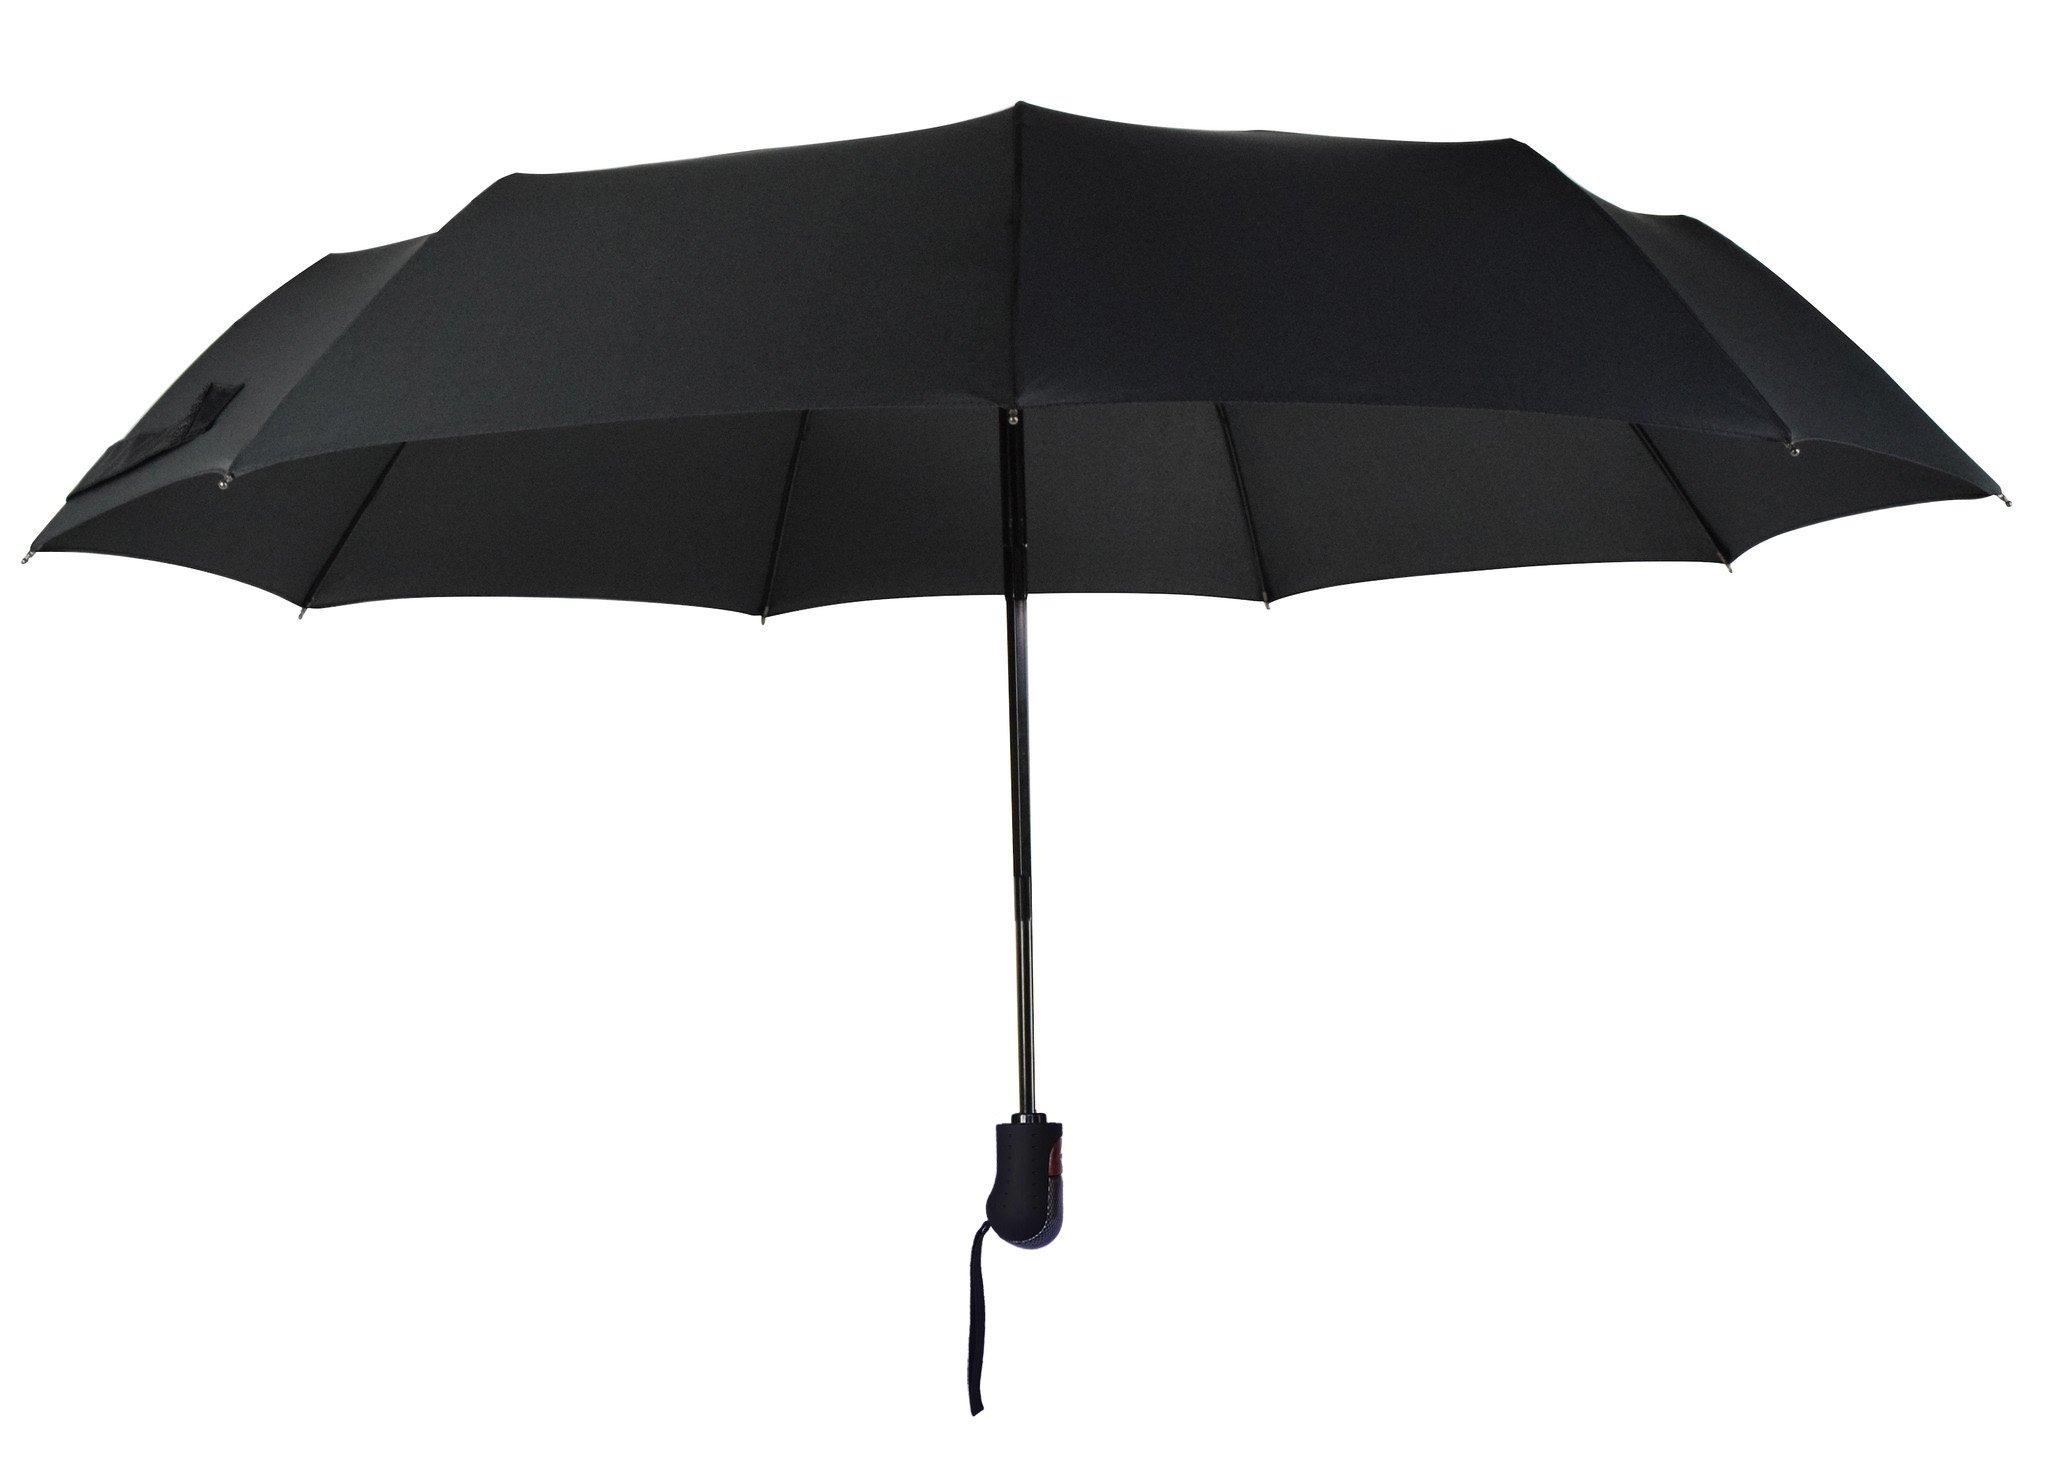 Umenice Auto Open And Closed travel umbrella 9 Ribs Black by Umenice (Image #3)